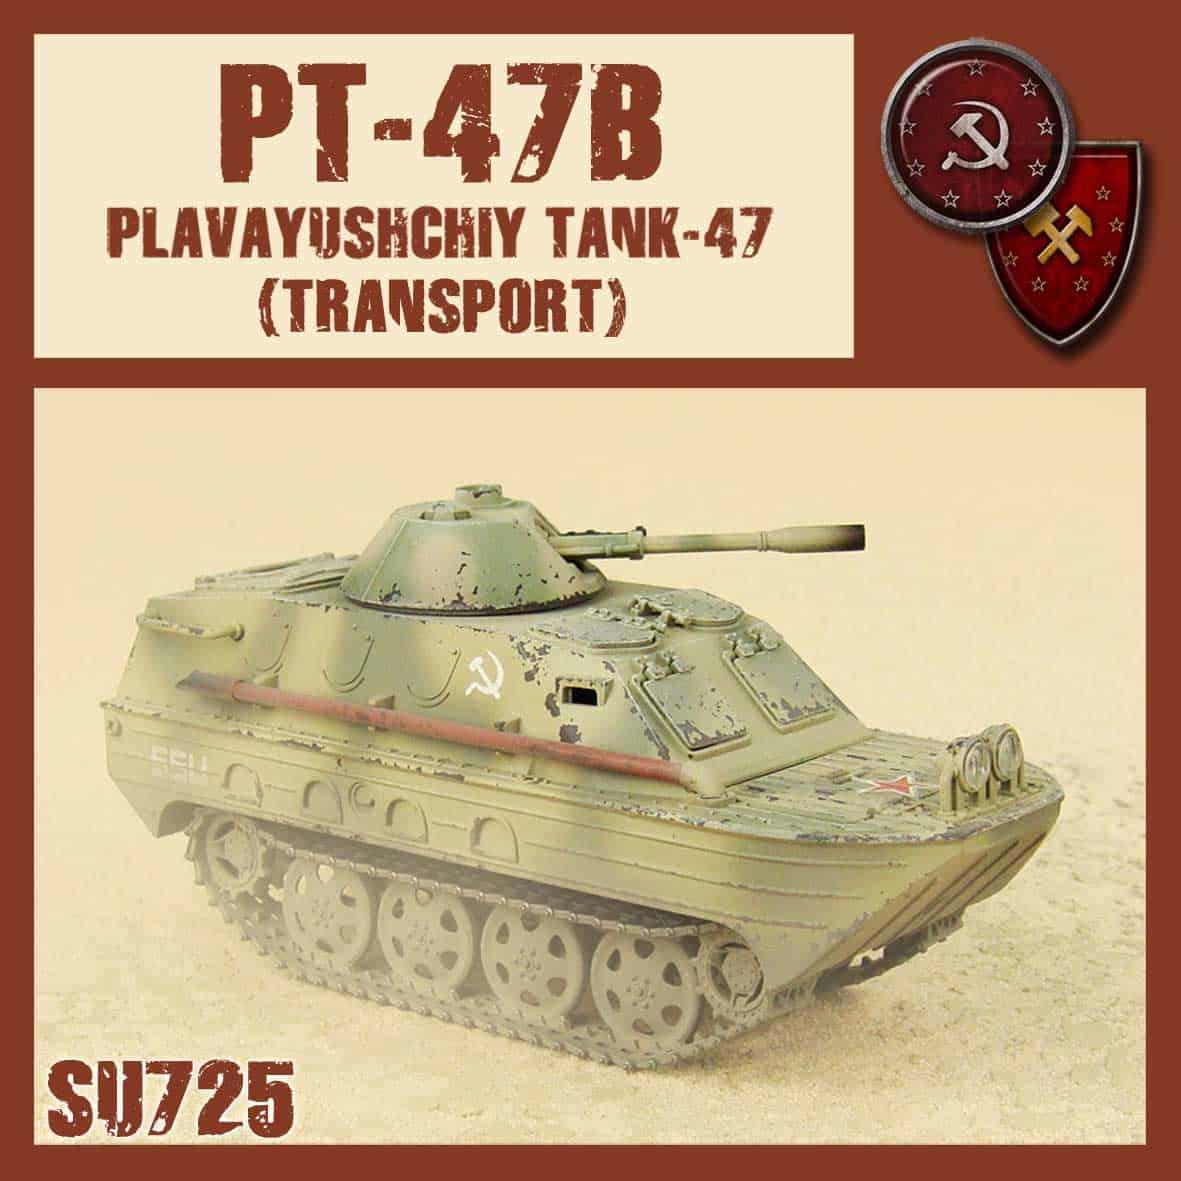 PT-47B – PLAVAYUSHCHIY TANK-47 (Transport)